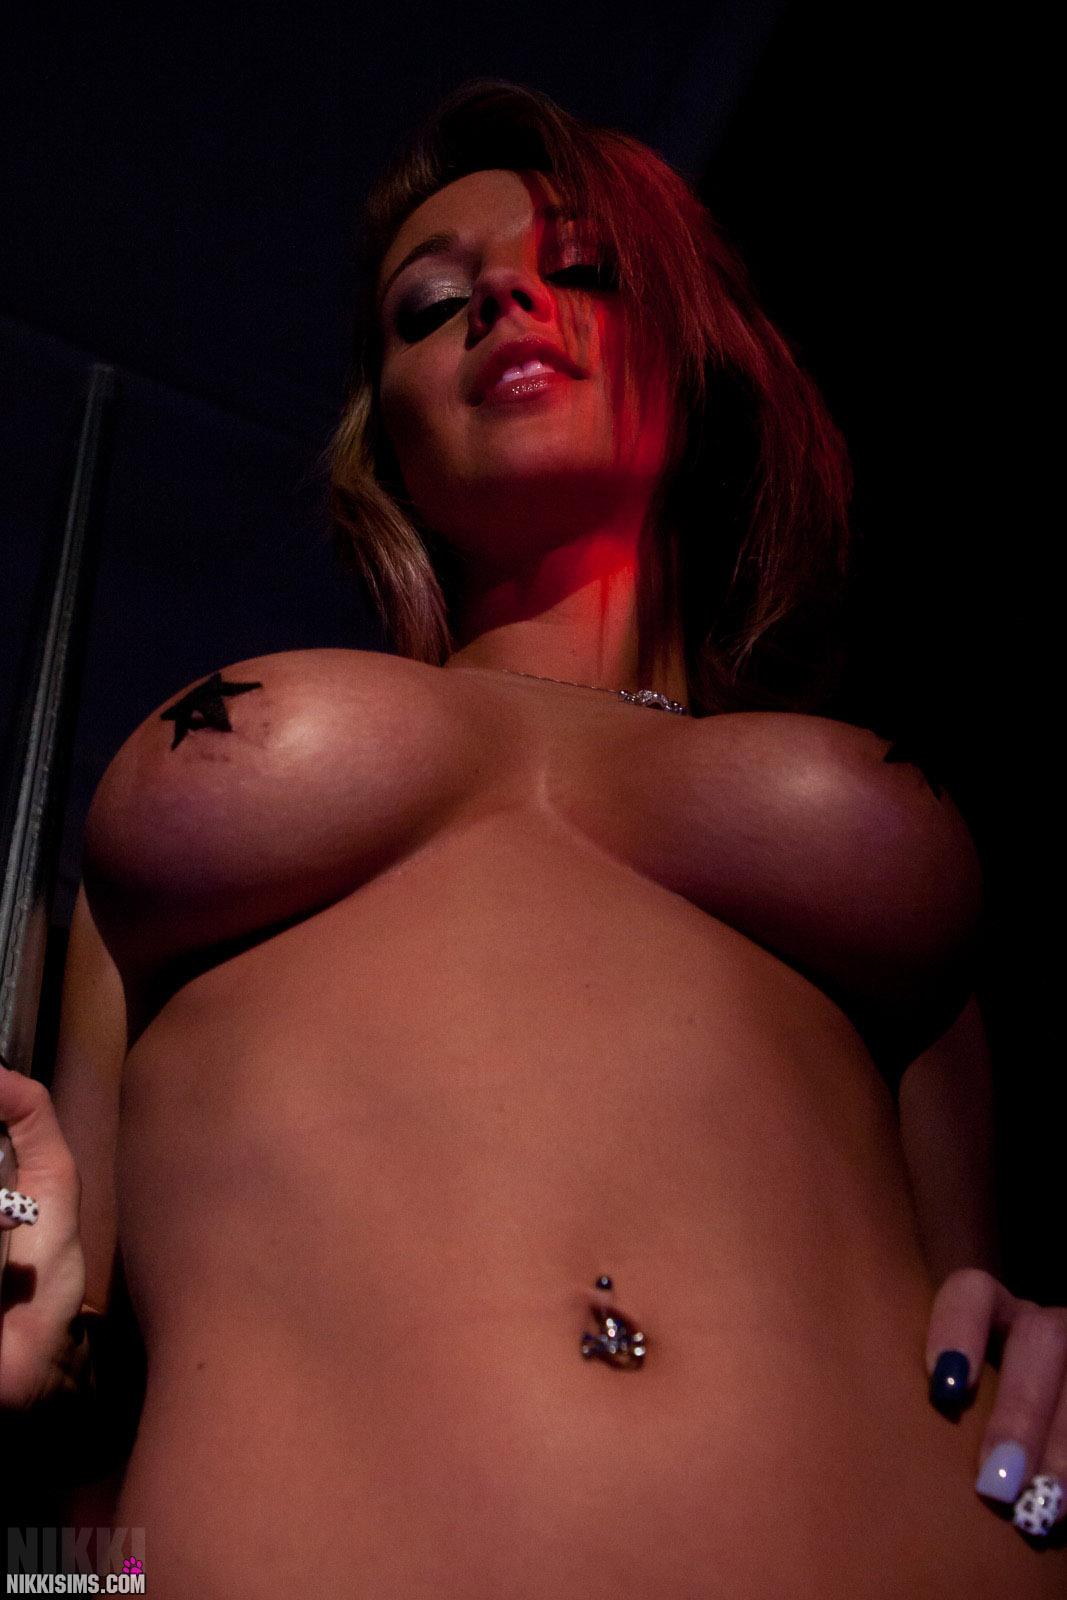 Hot nude girl nikki sims, spreading nude ladies